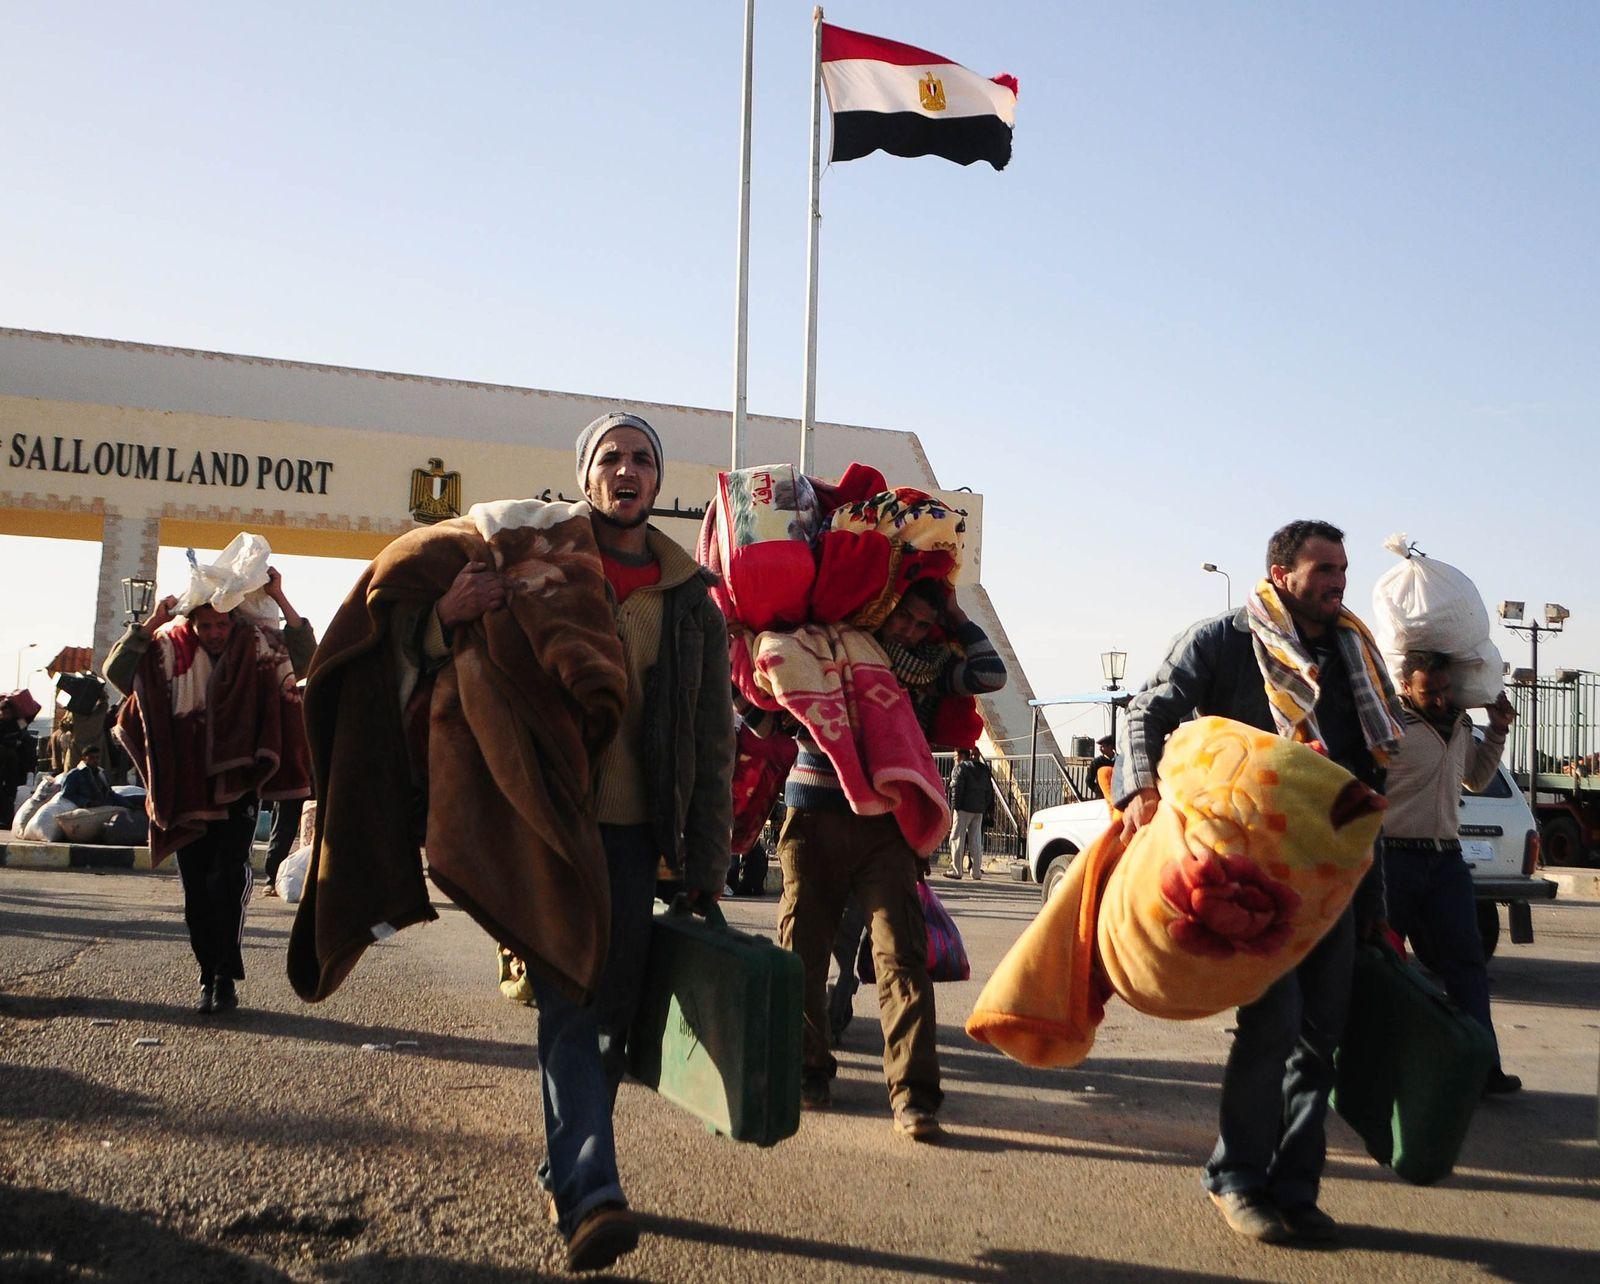 Libyen / Grenzübergang Ägypten (Sallum)